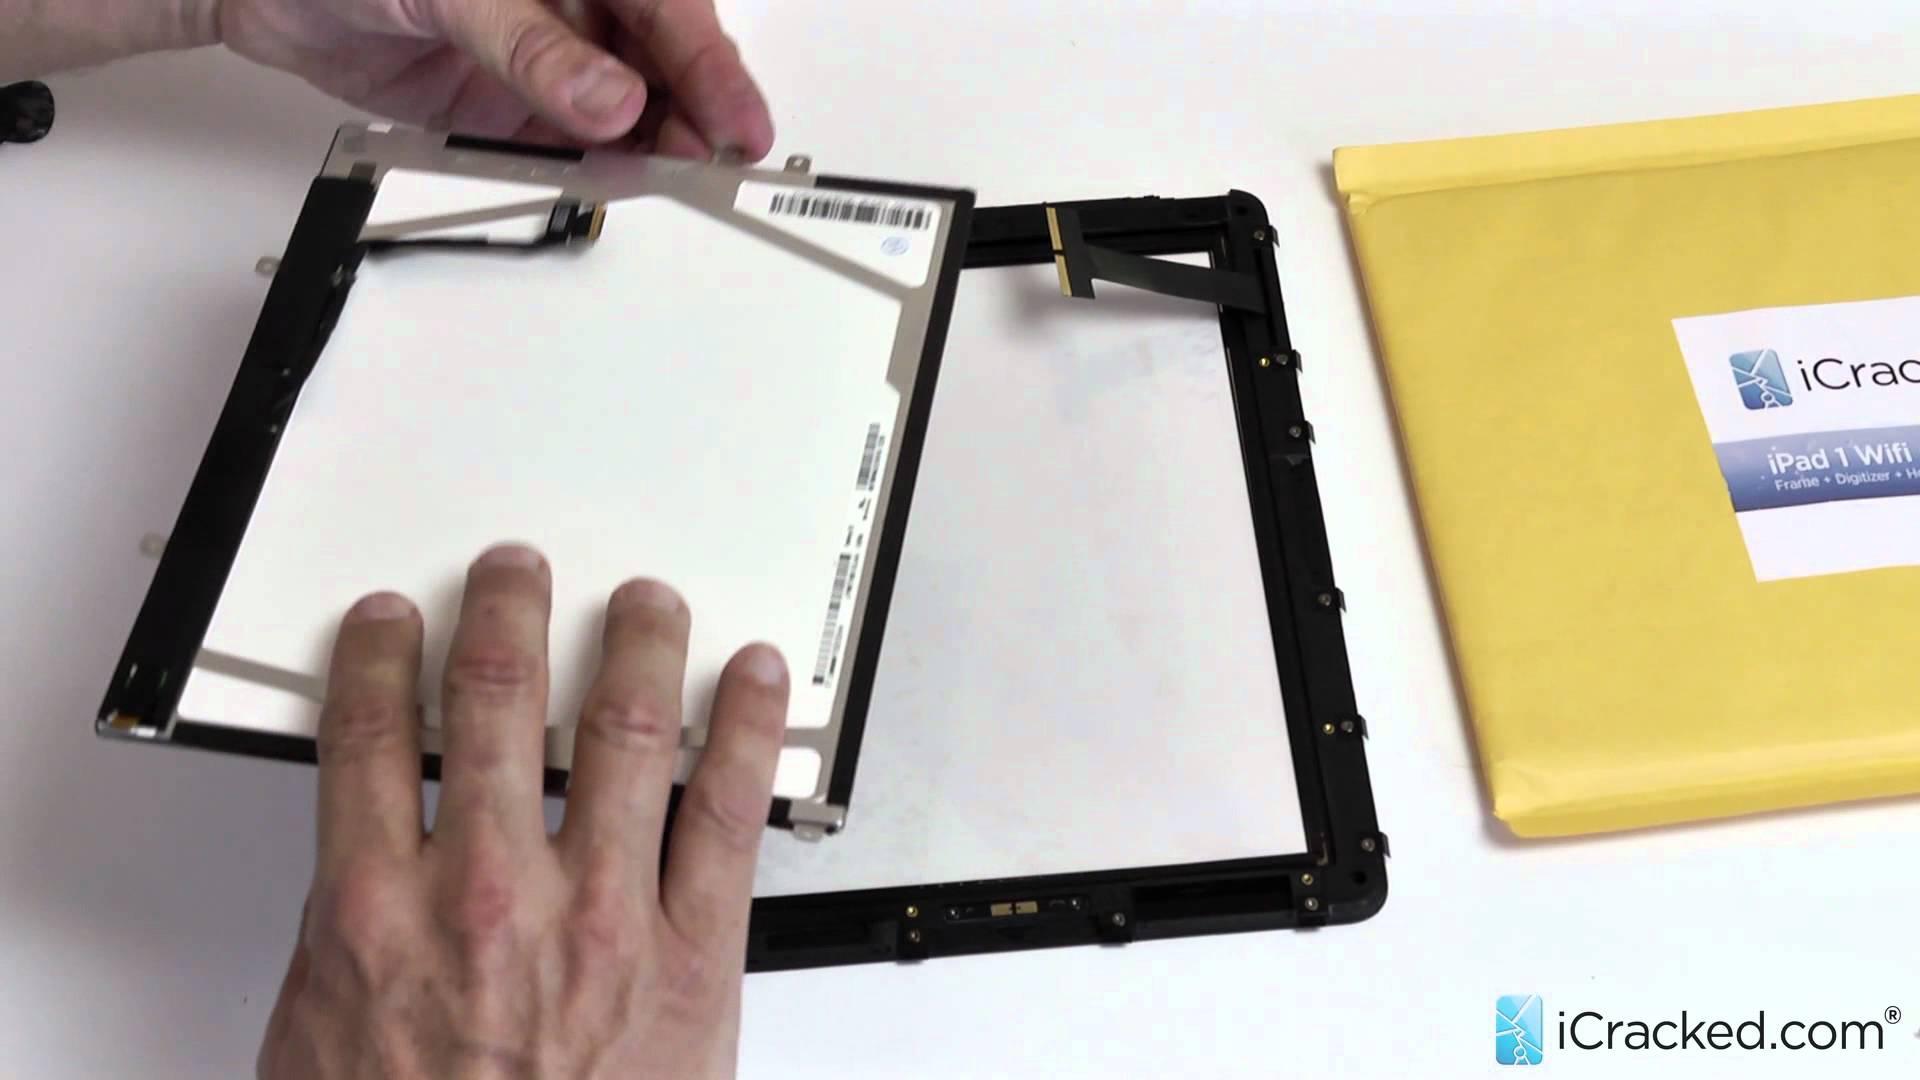 iPad 1(初代) LCD液晶 修理交換取付方法動画